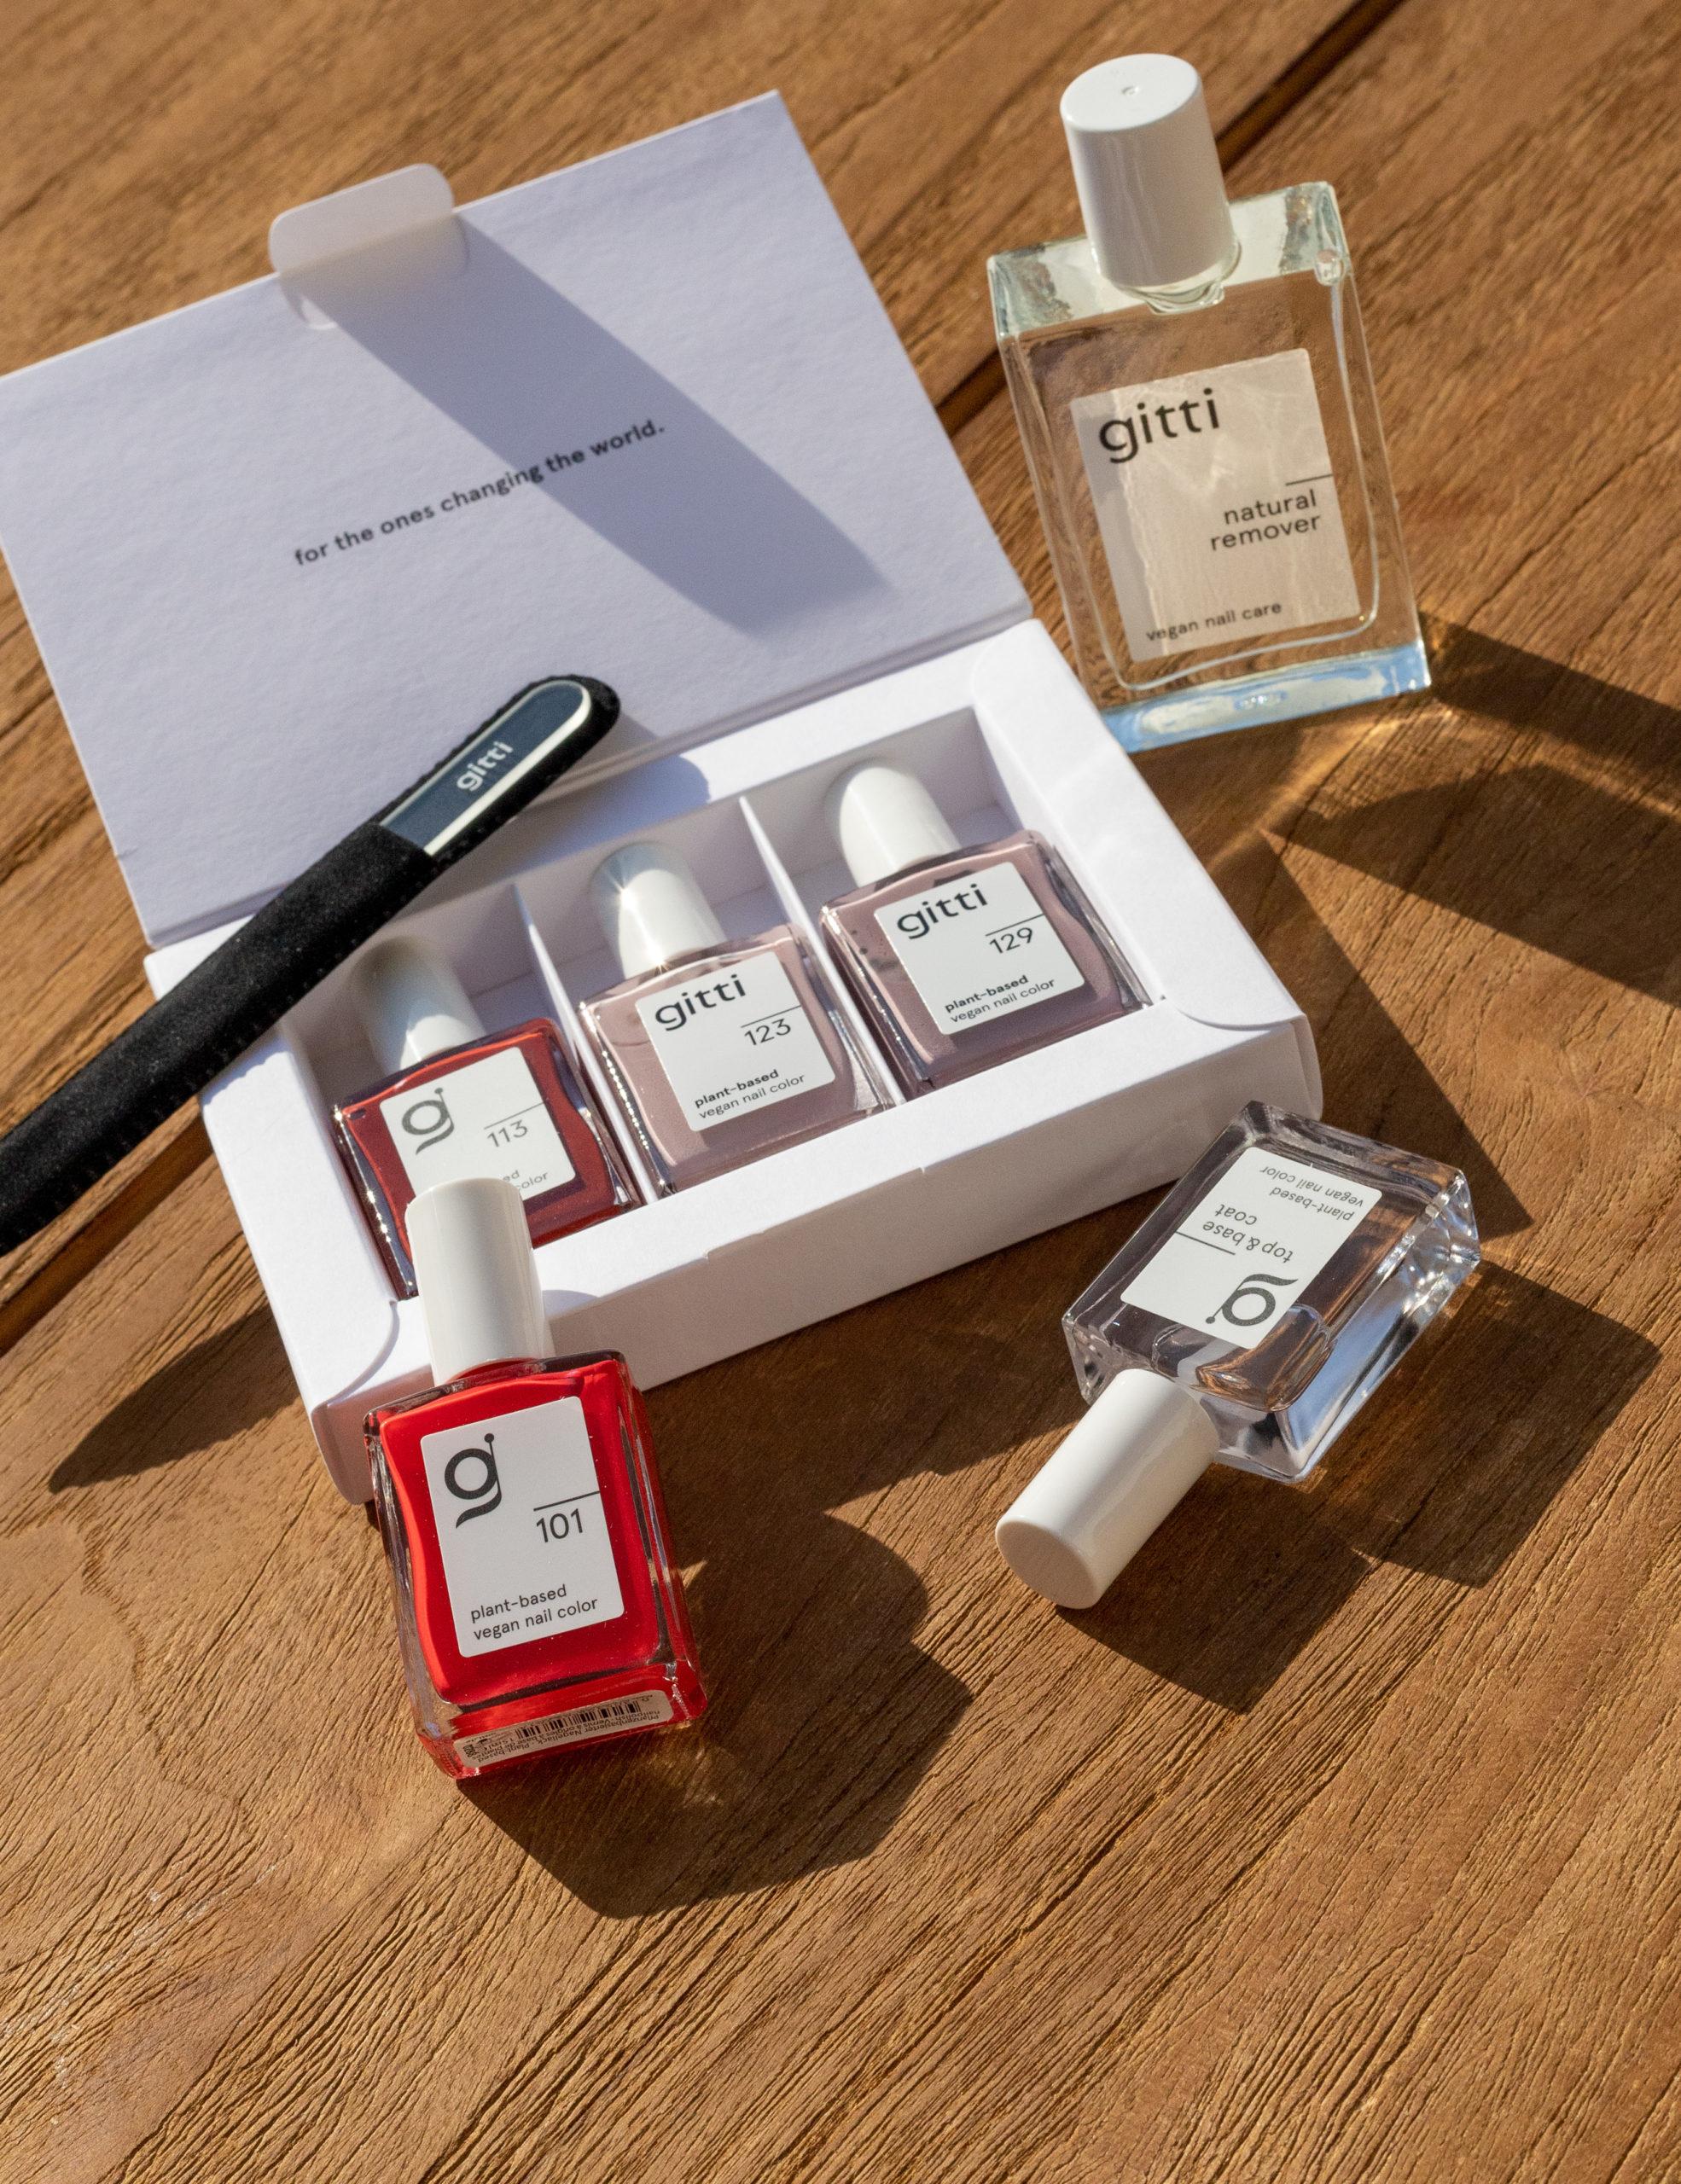 Verpackung & Design